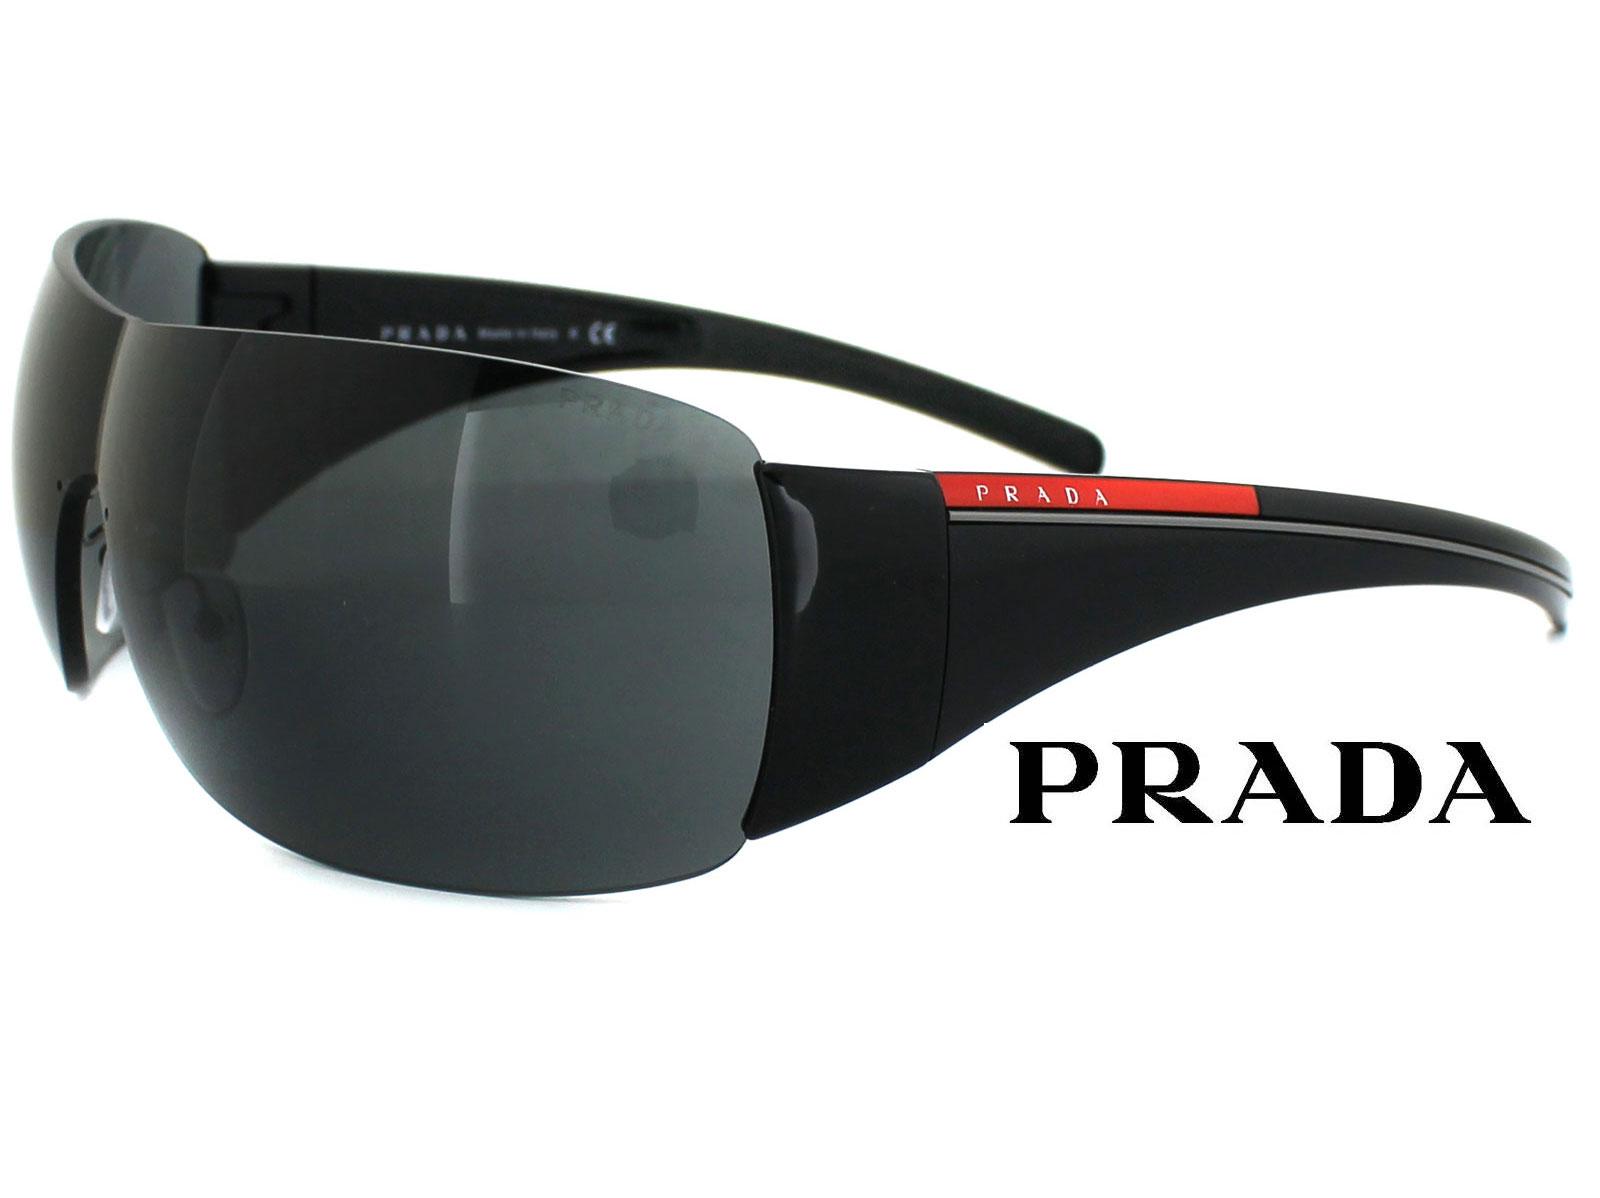 Prada Sport coming soon!